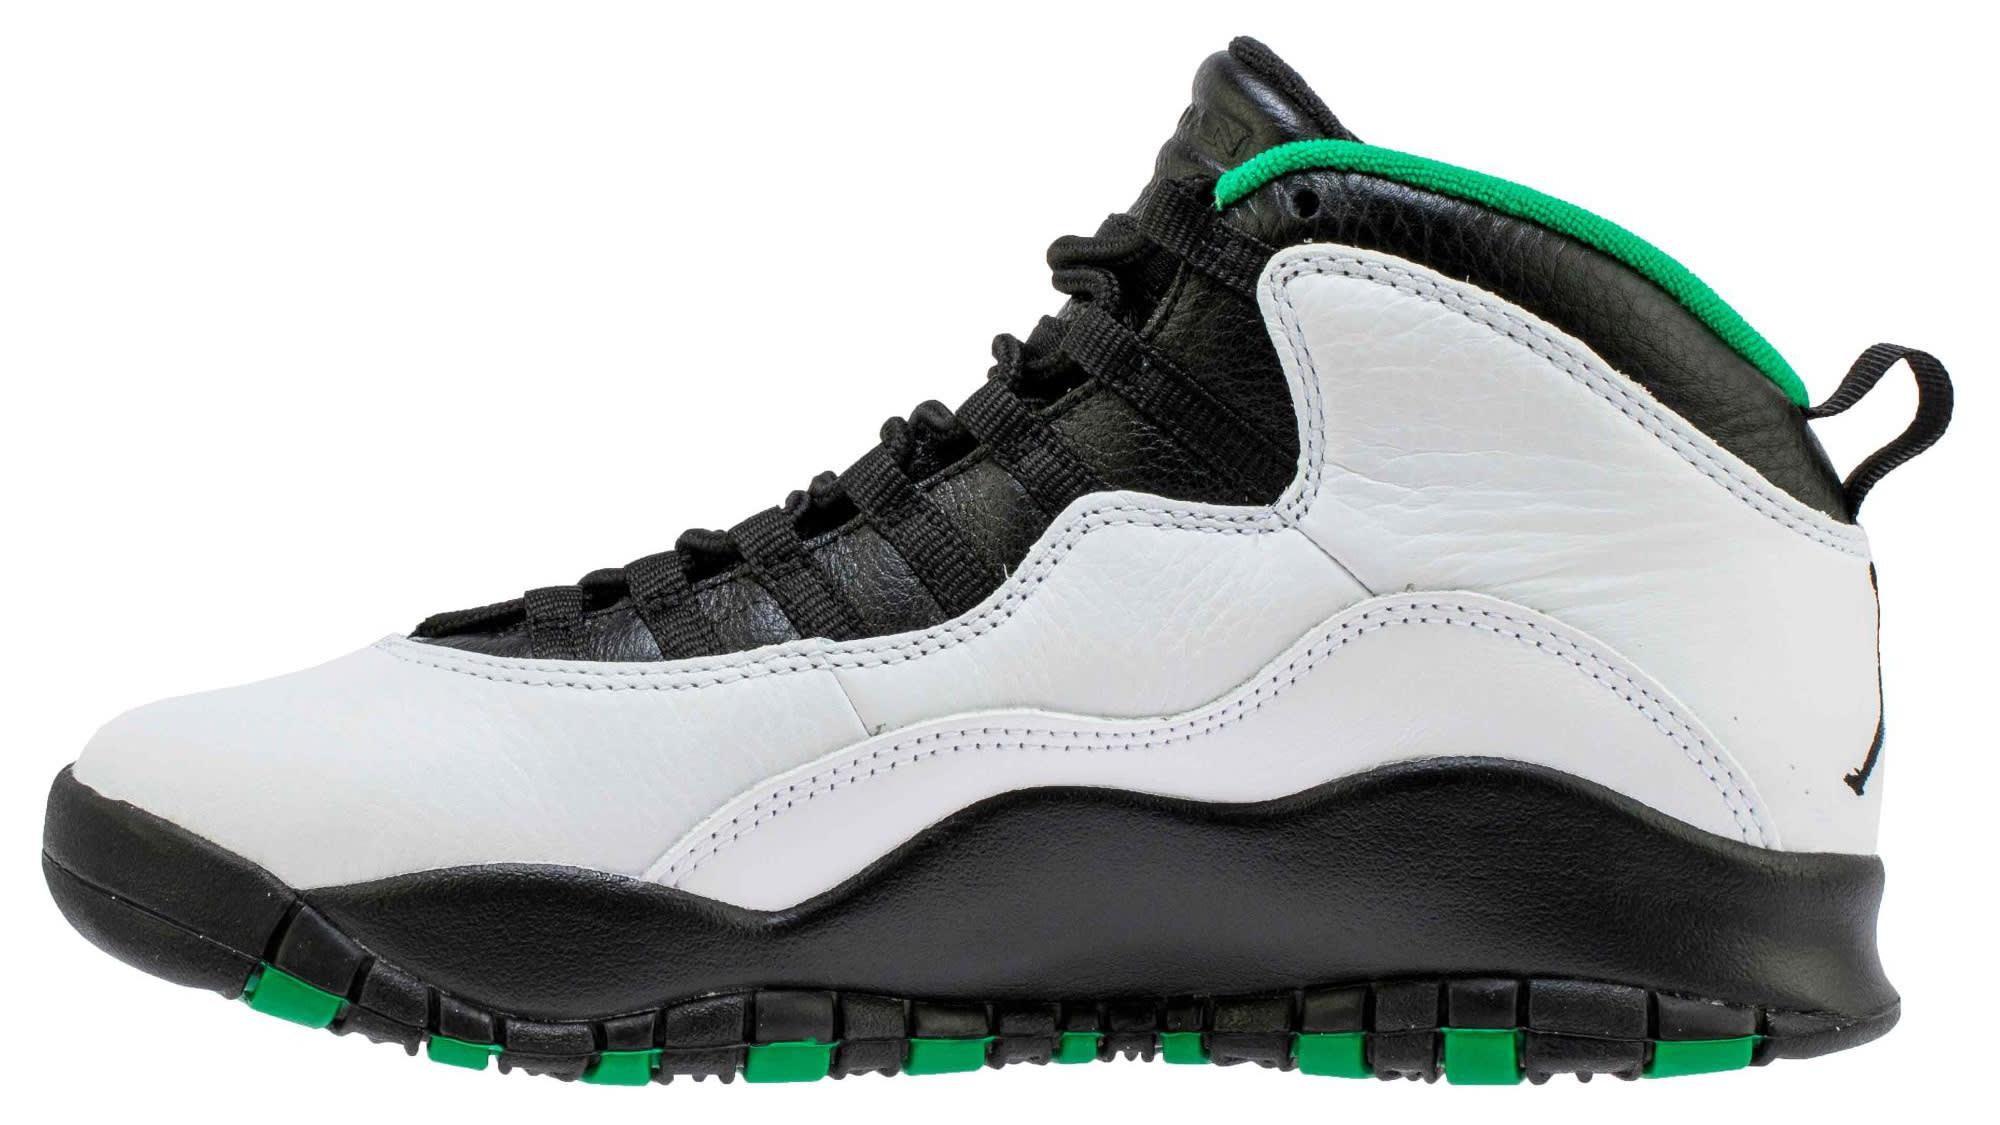 Air Jordan 10 Seattle Release Date 310805-137 Medial